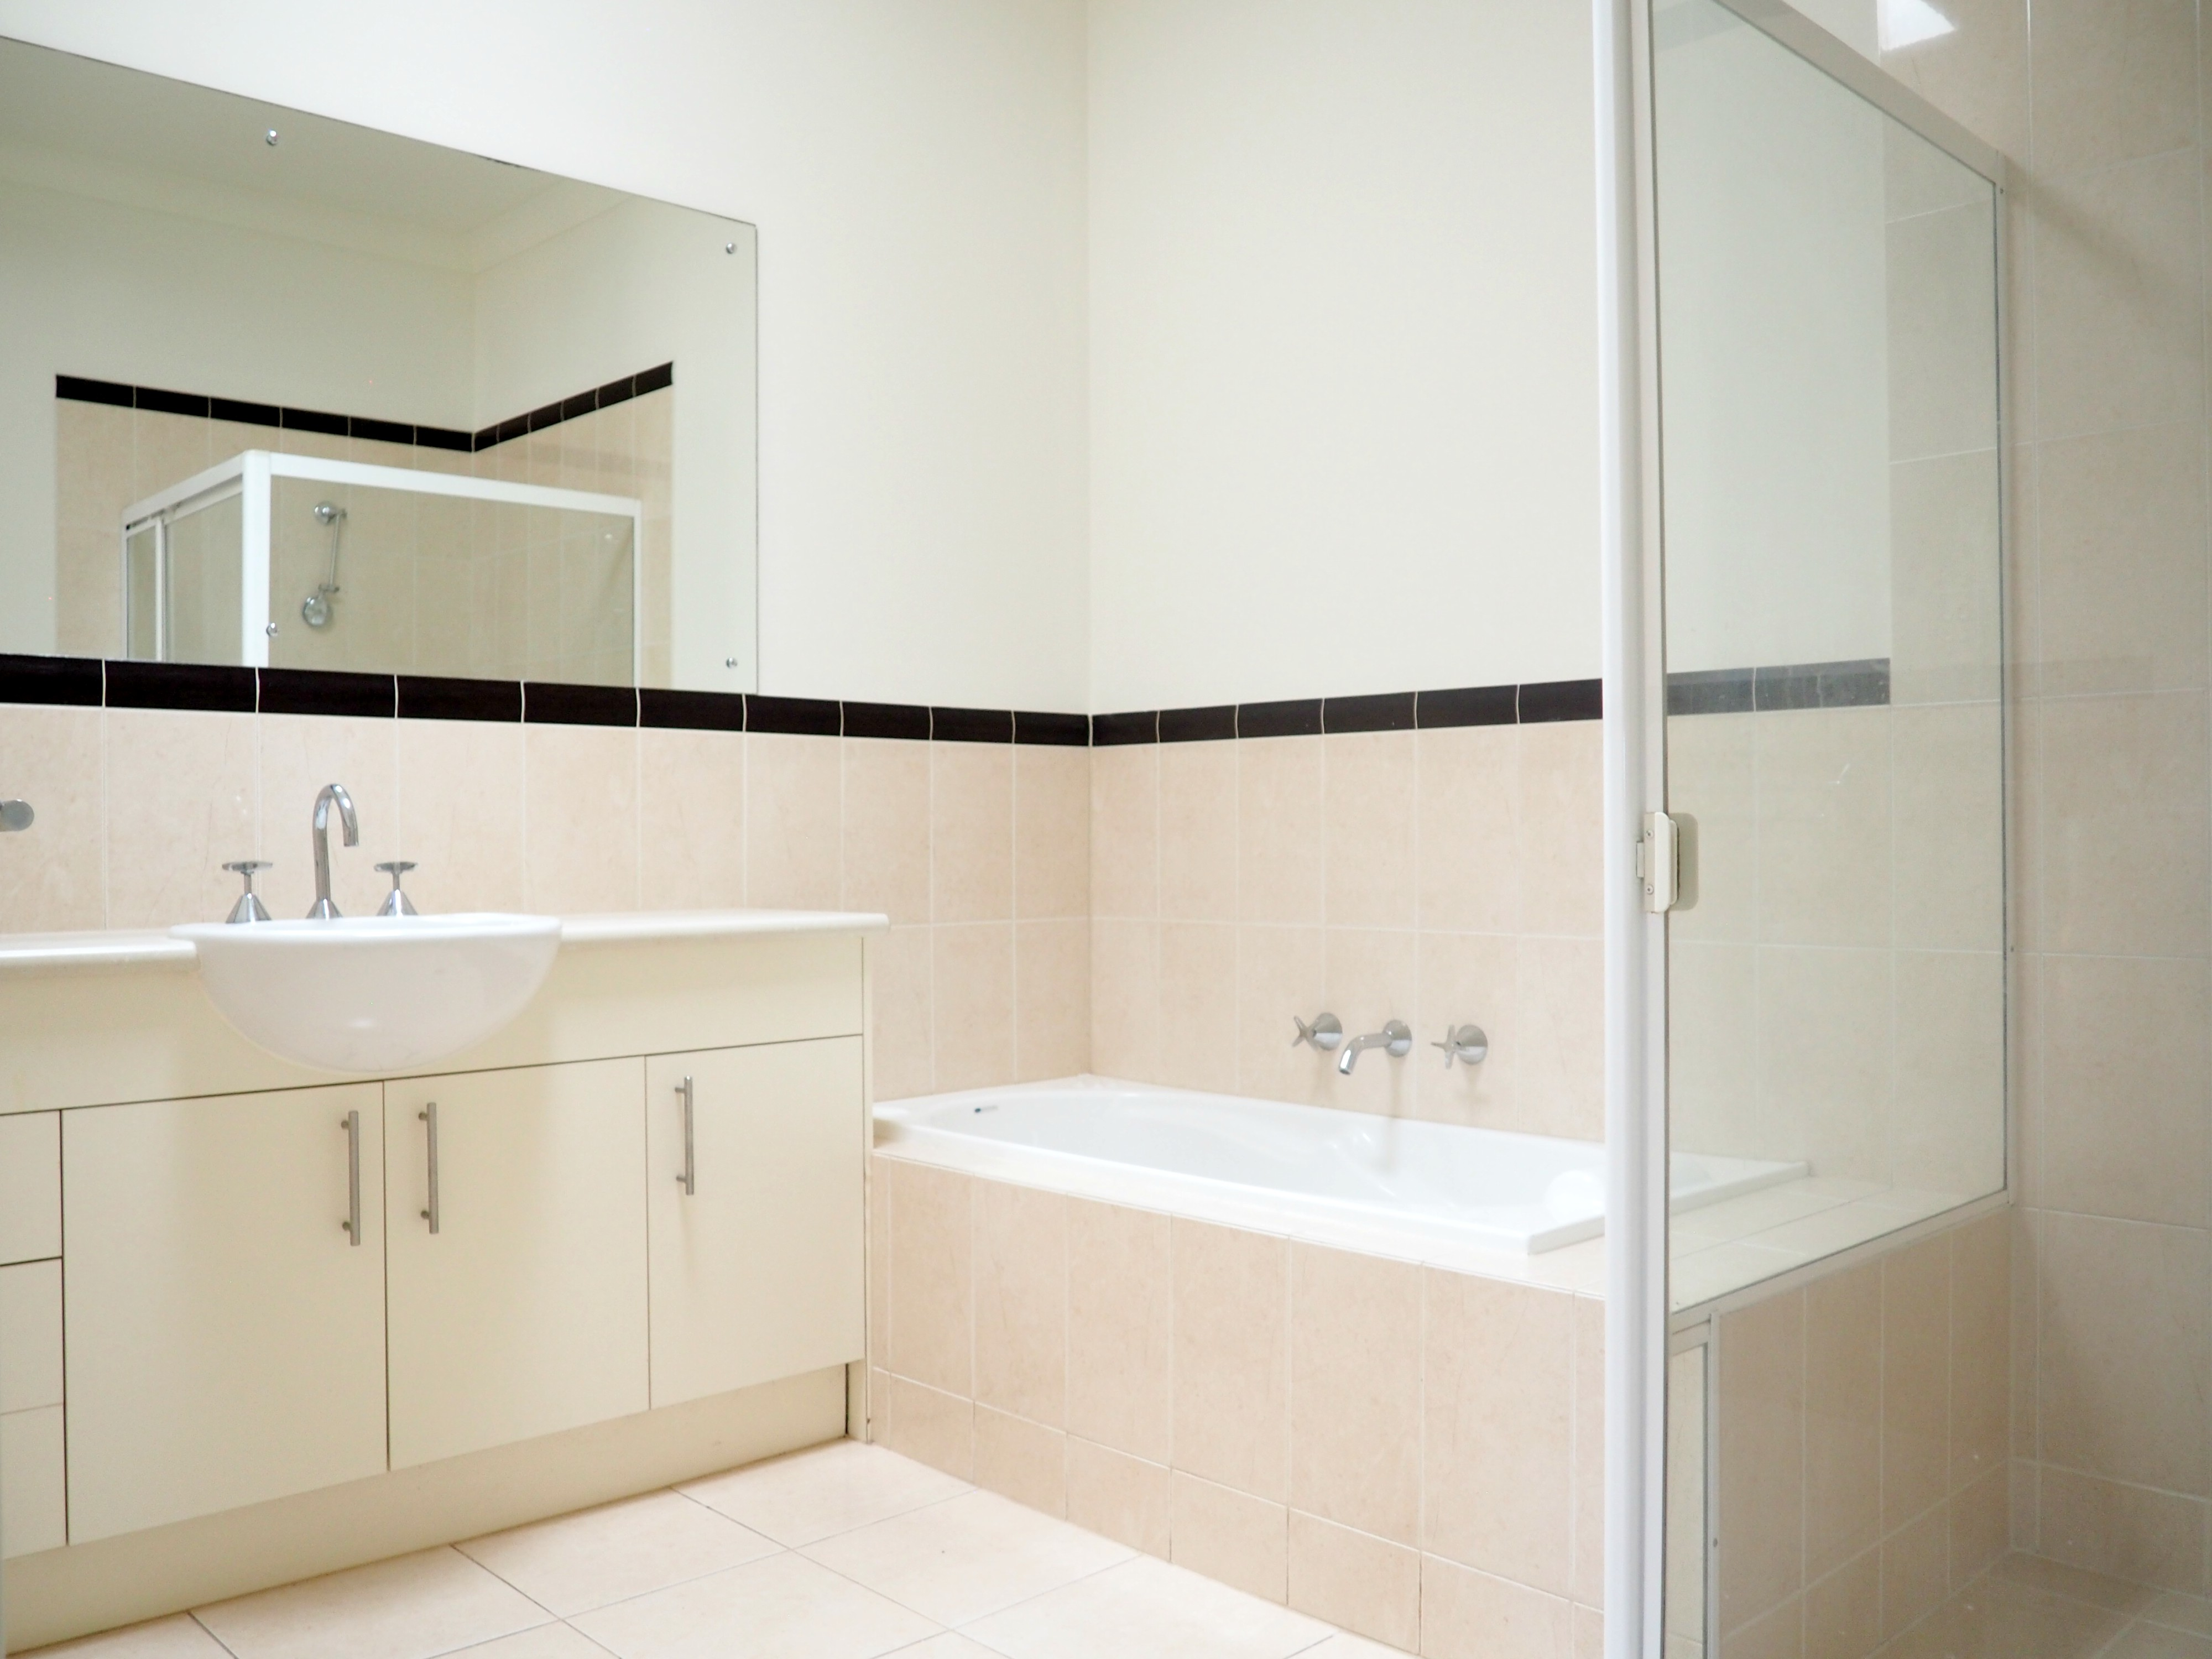 mydimport-1596538590-hires.17672-bathroom.JPG